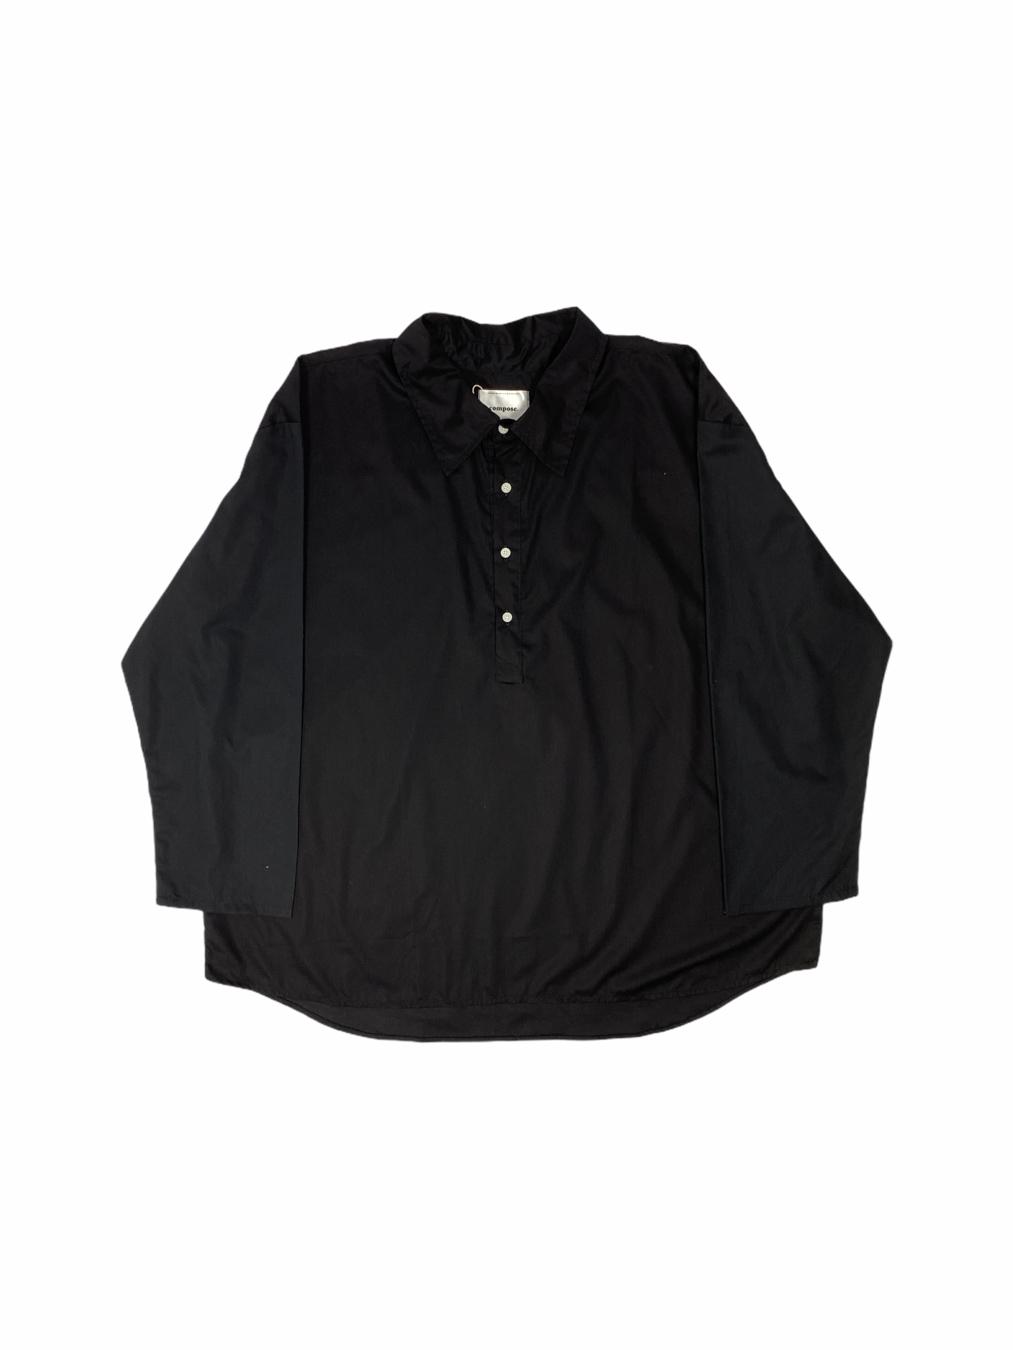 Maxi Wide Shirt (Black)